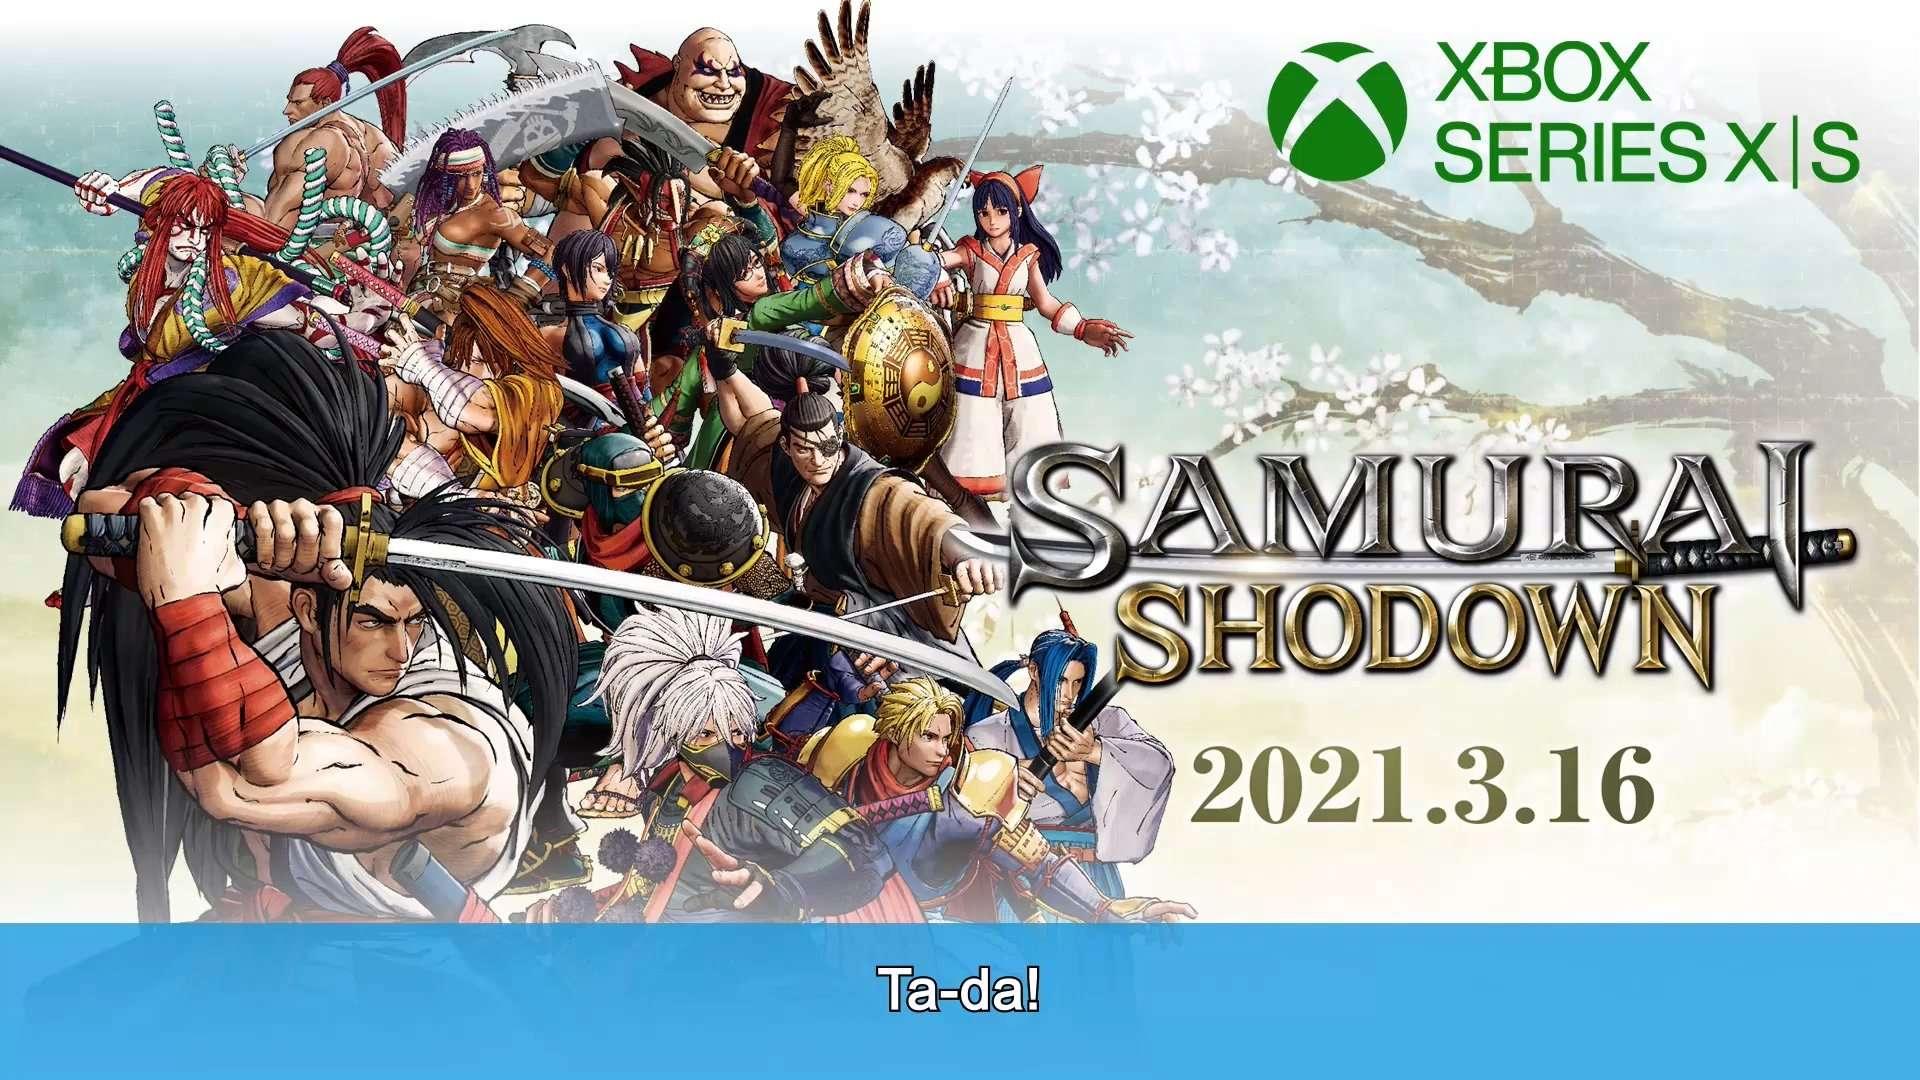 b7dc383be23271e021efa4b0a81c0573 - الكشف عن موعد صدور Samurai Shodown لمنصة الـXbox